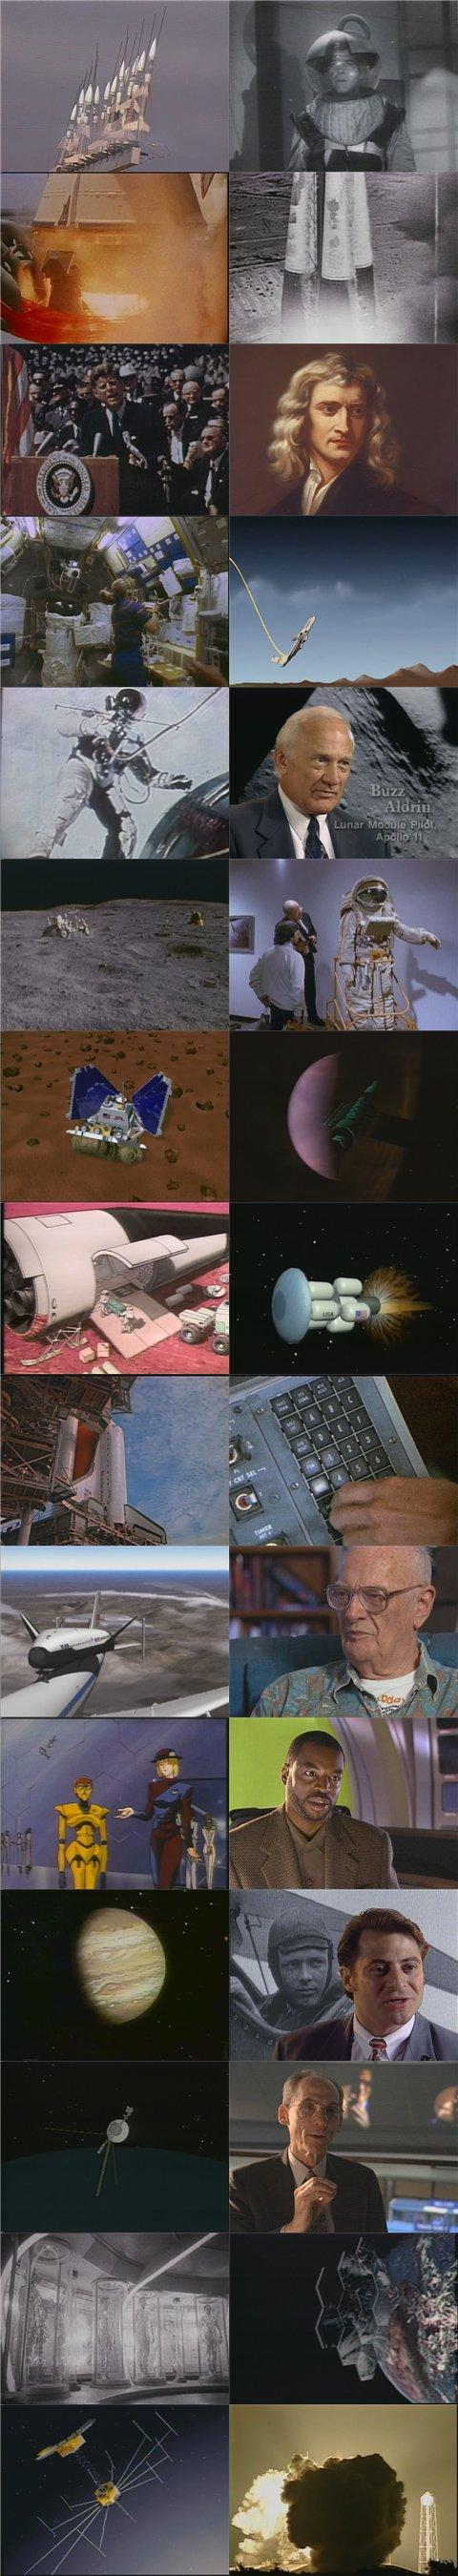 DSC Understanding: Space Travel DivX AC3 dual audio ( preview 1